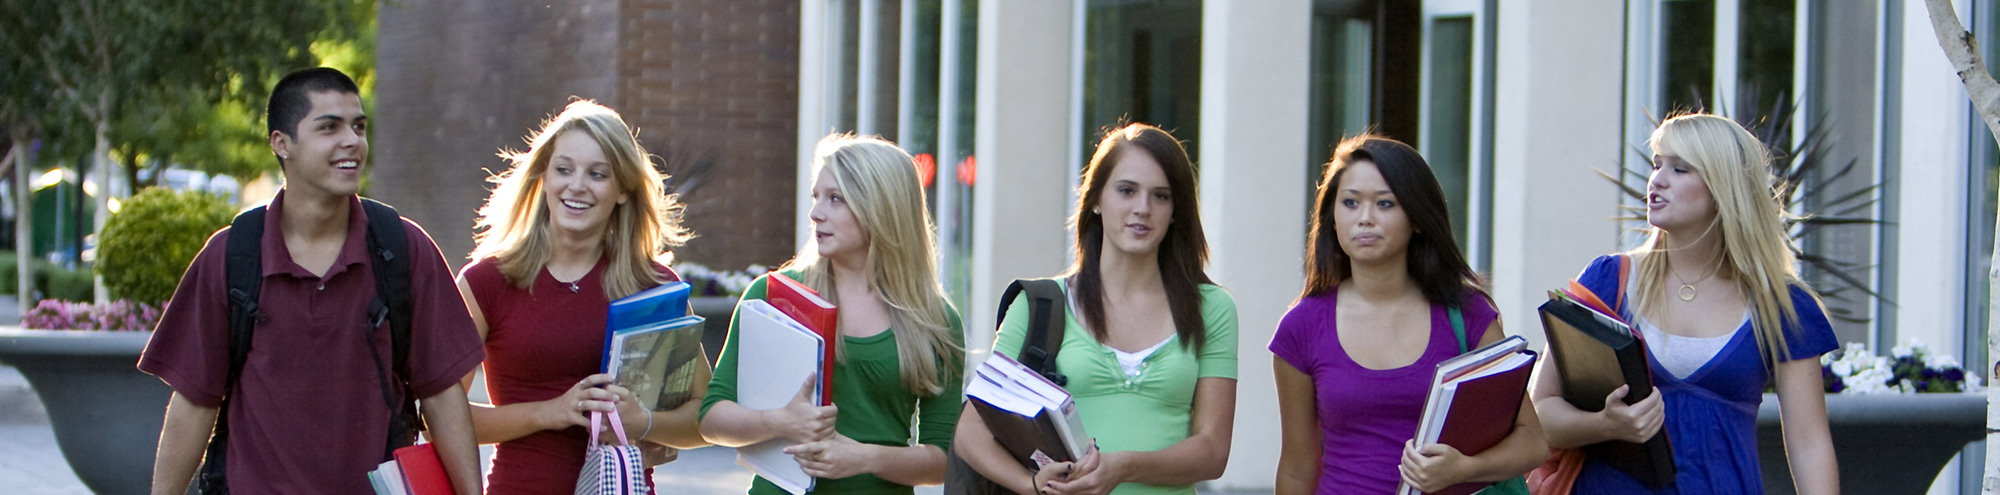 high school students walking outside